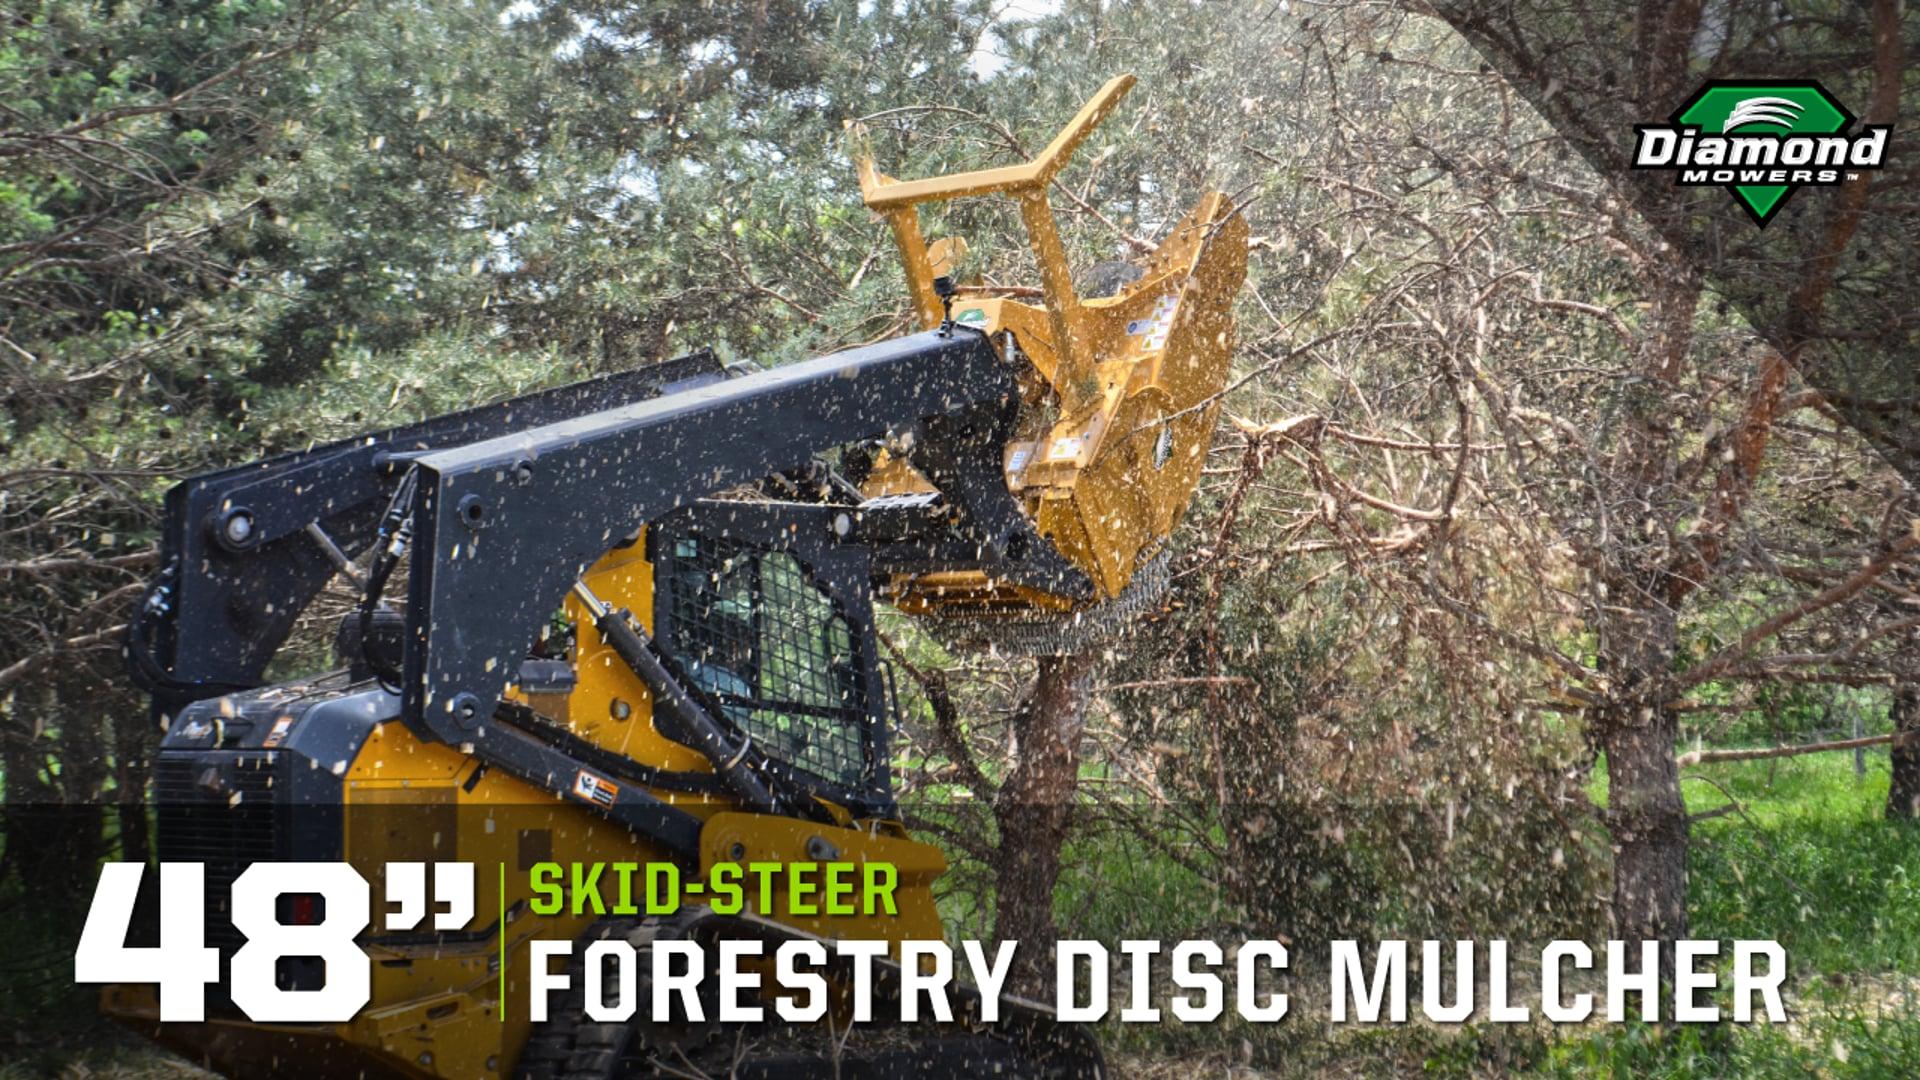 "Skid-Steer 48"" Forestry Disc Mulcher - Diamond Mowers"